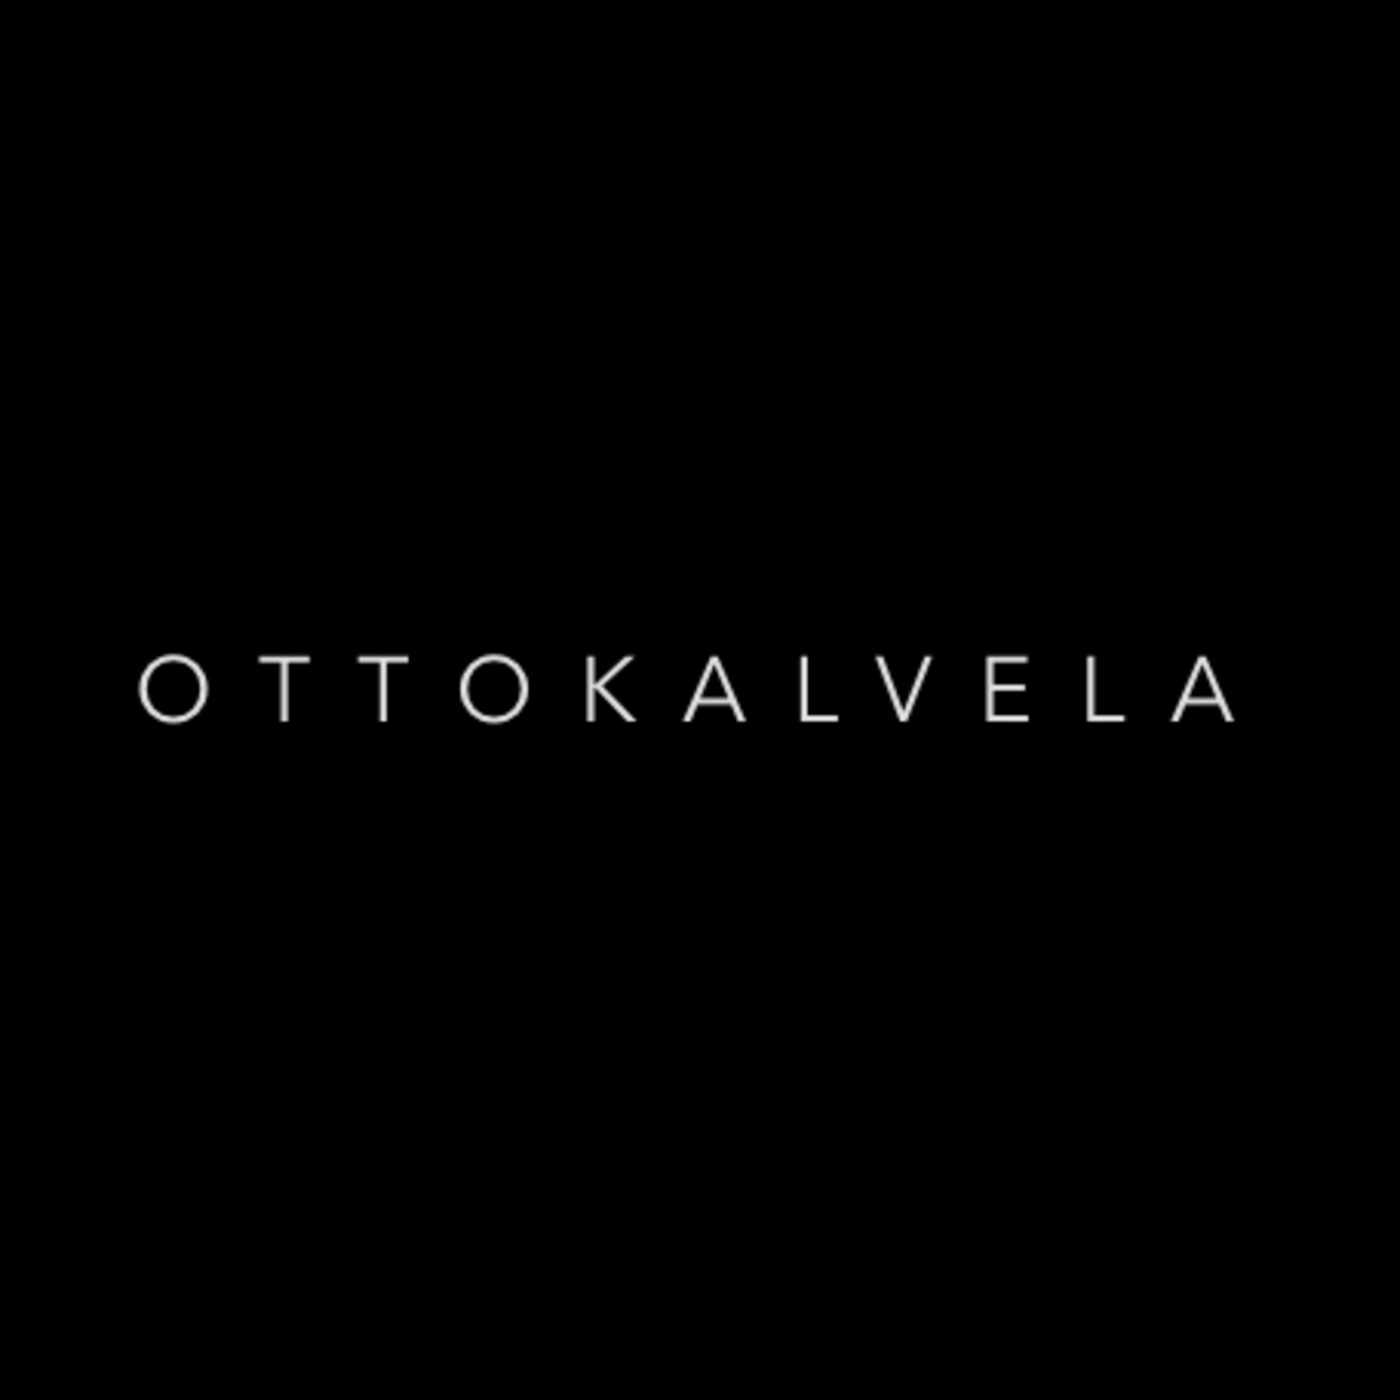 MIXTAPE by O T T O K A L V E L A